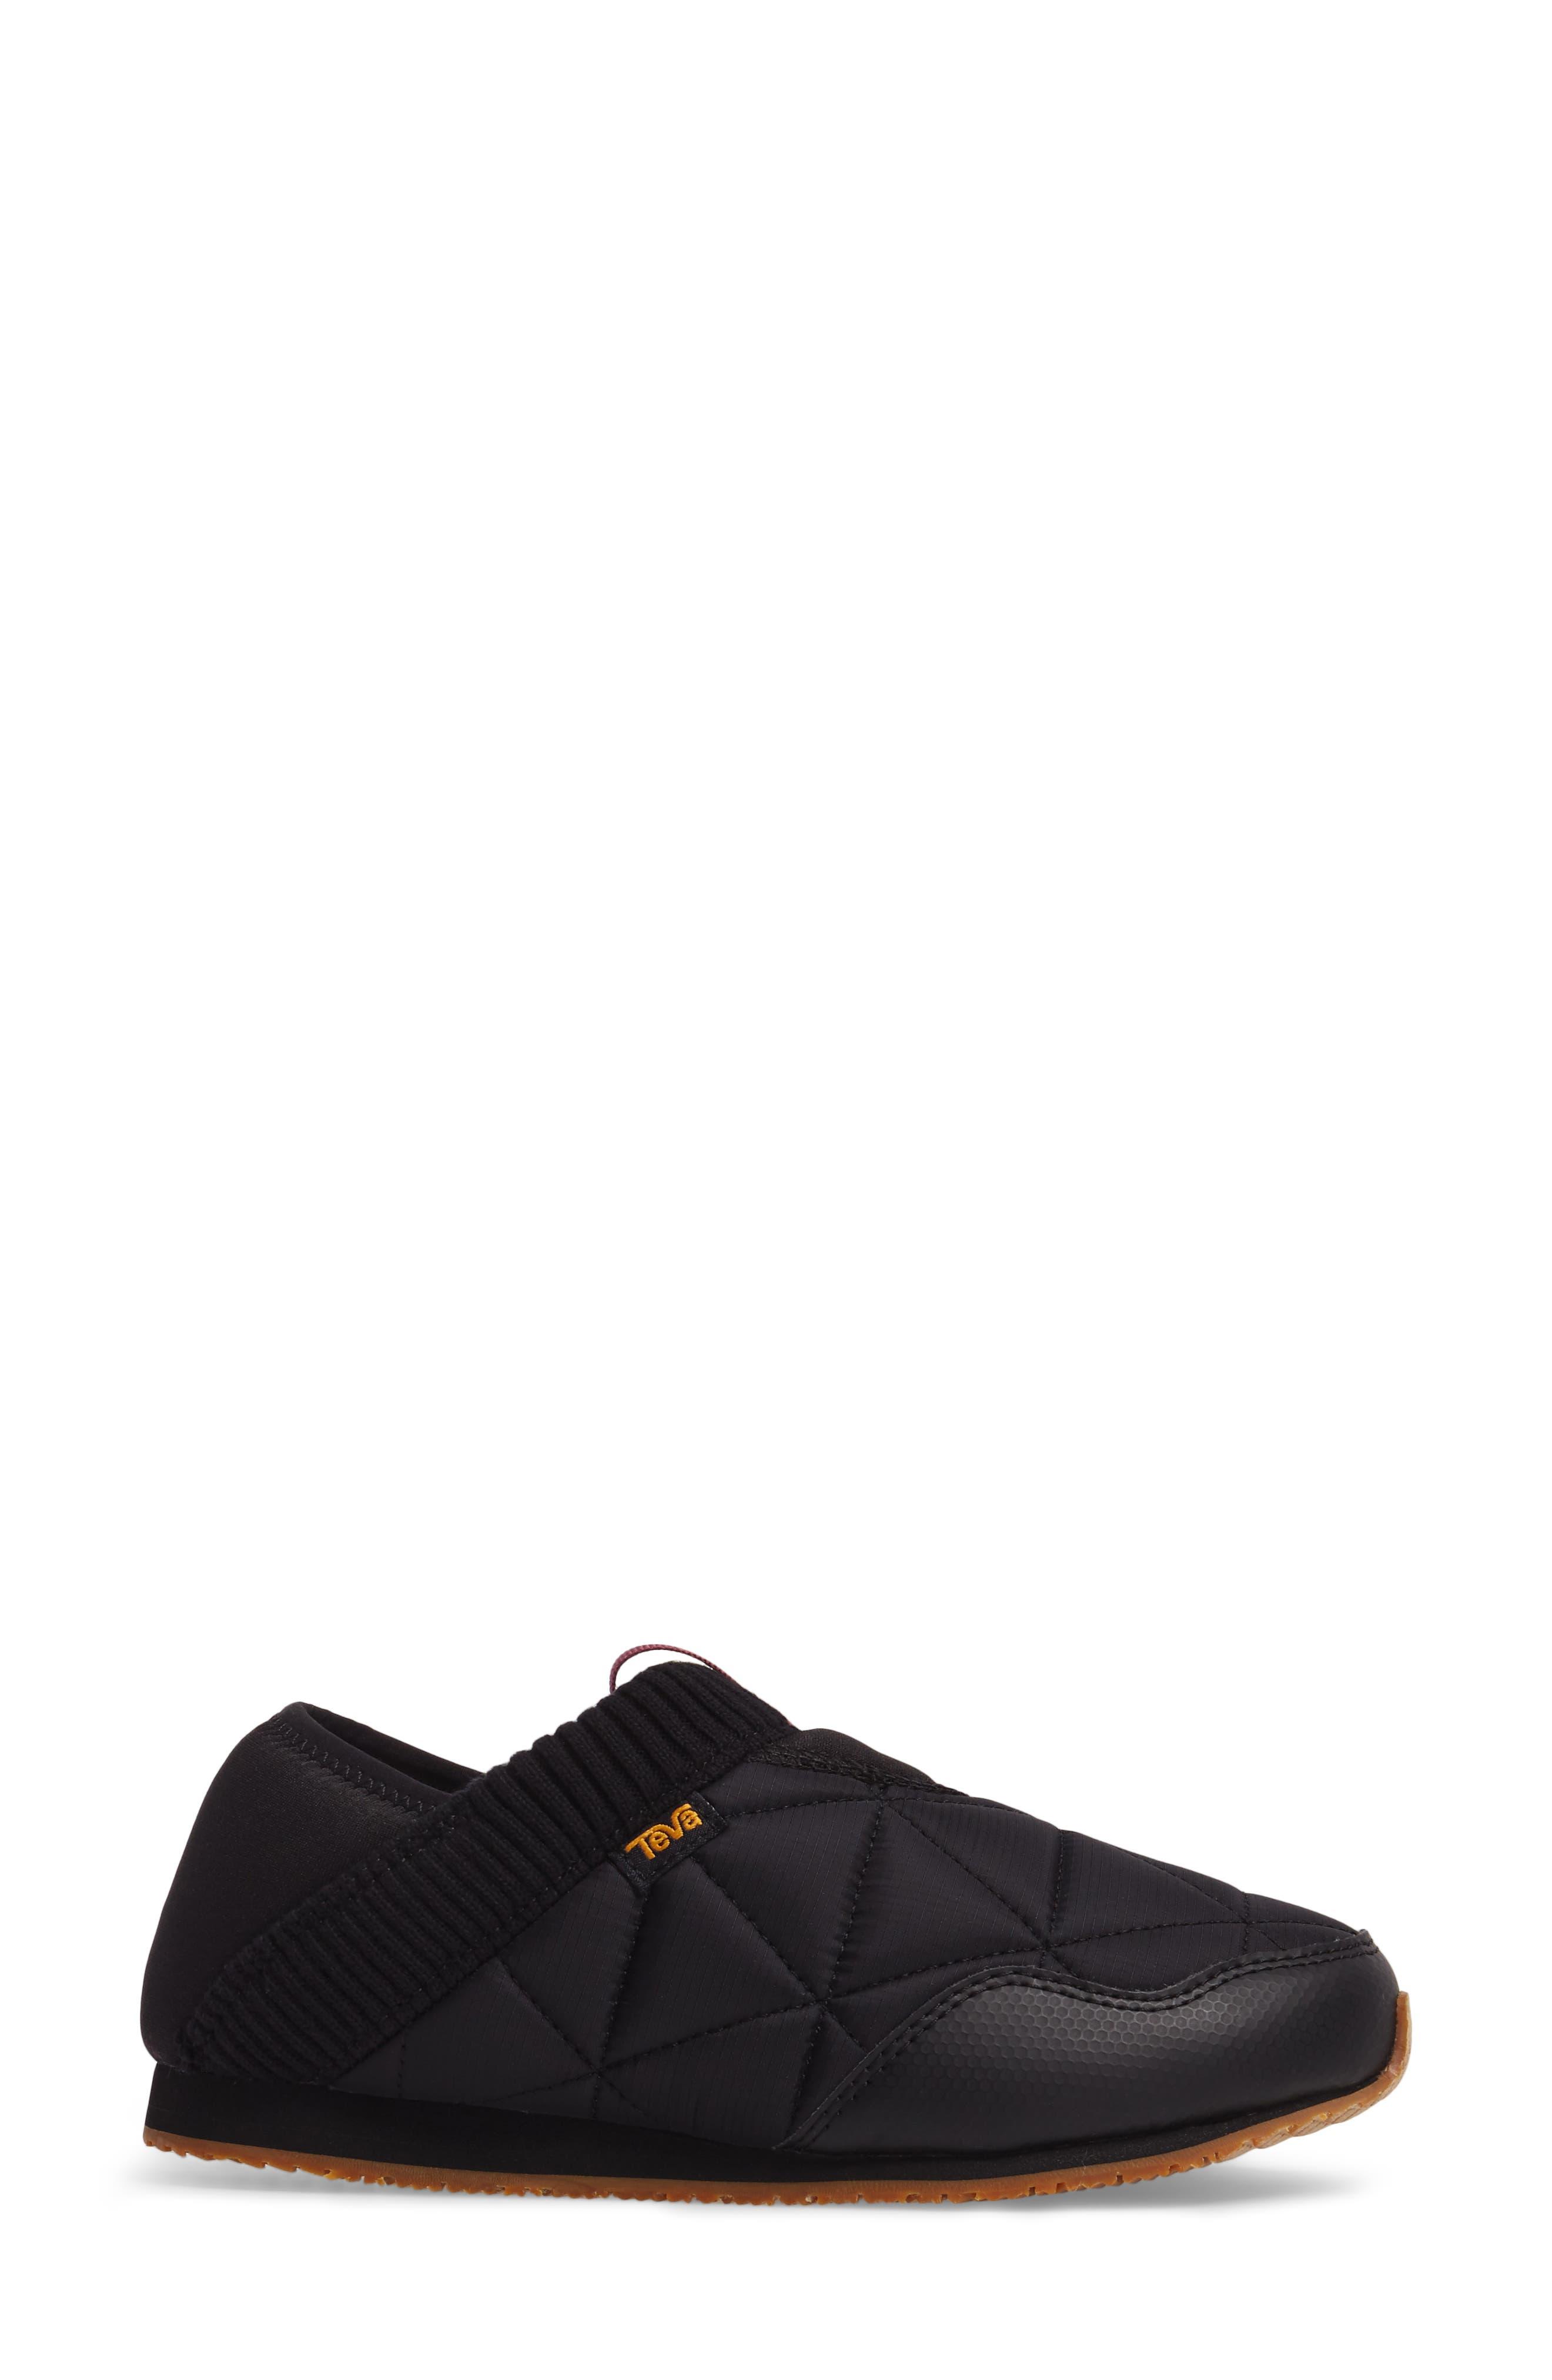 TEVA, Ember Convertible Slip-On, Alternate thumbnail 3, color, BLACK FABRIC